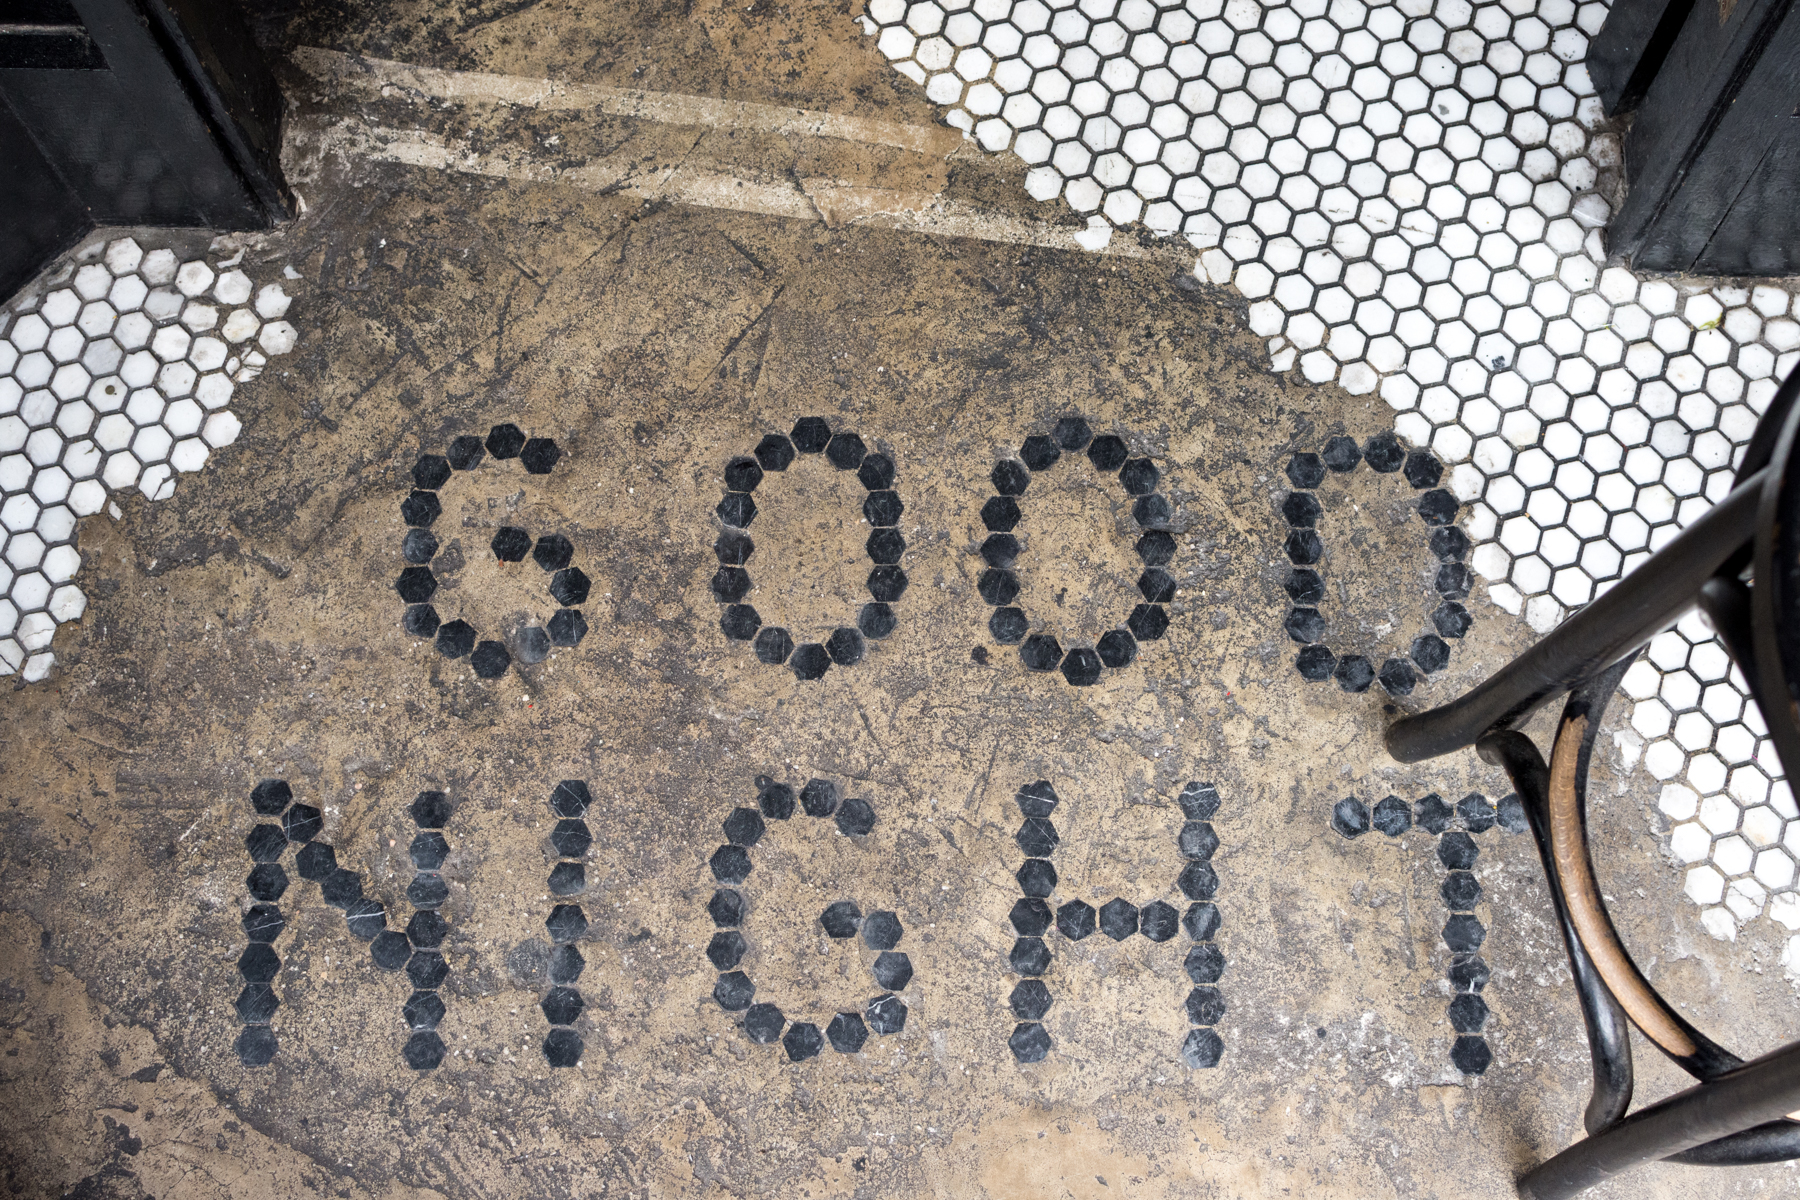 GoodnightSonny_small (6 of 99).jpg